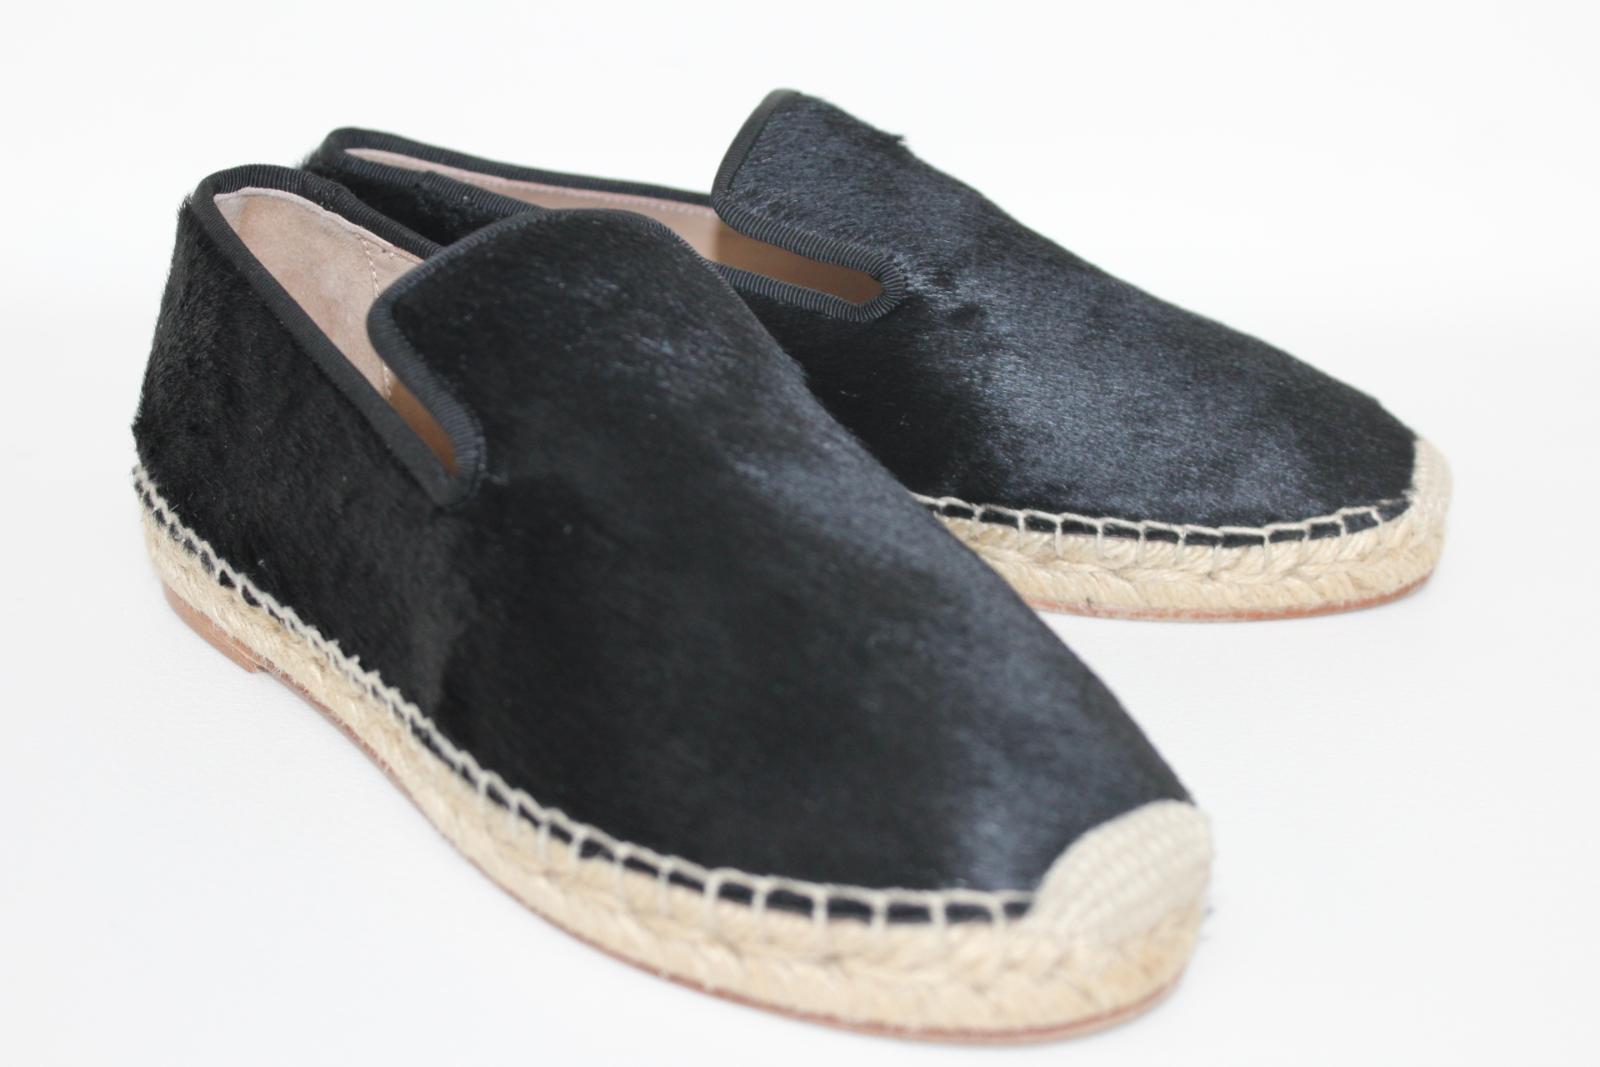 CELINE-Stacy-Black-Pony-Hair-Ladies-Flat-Espadrilles-Shoes-UK3-EU36-5-BNIB thumbnail 2